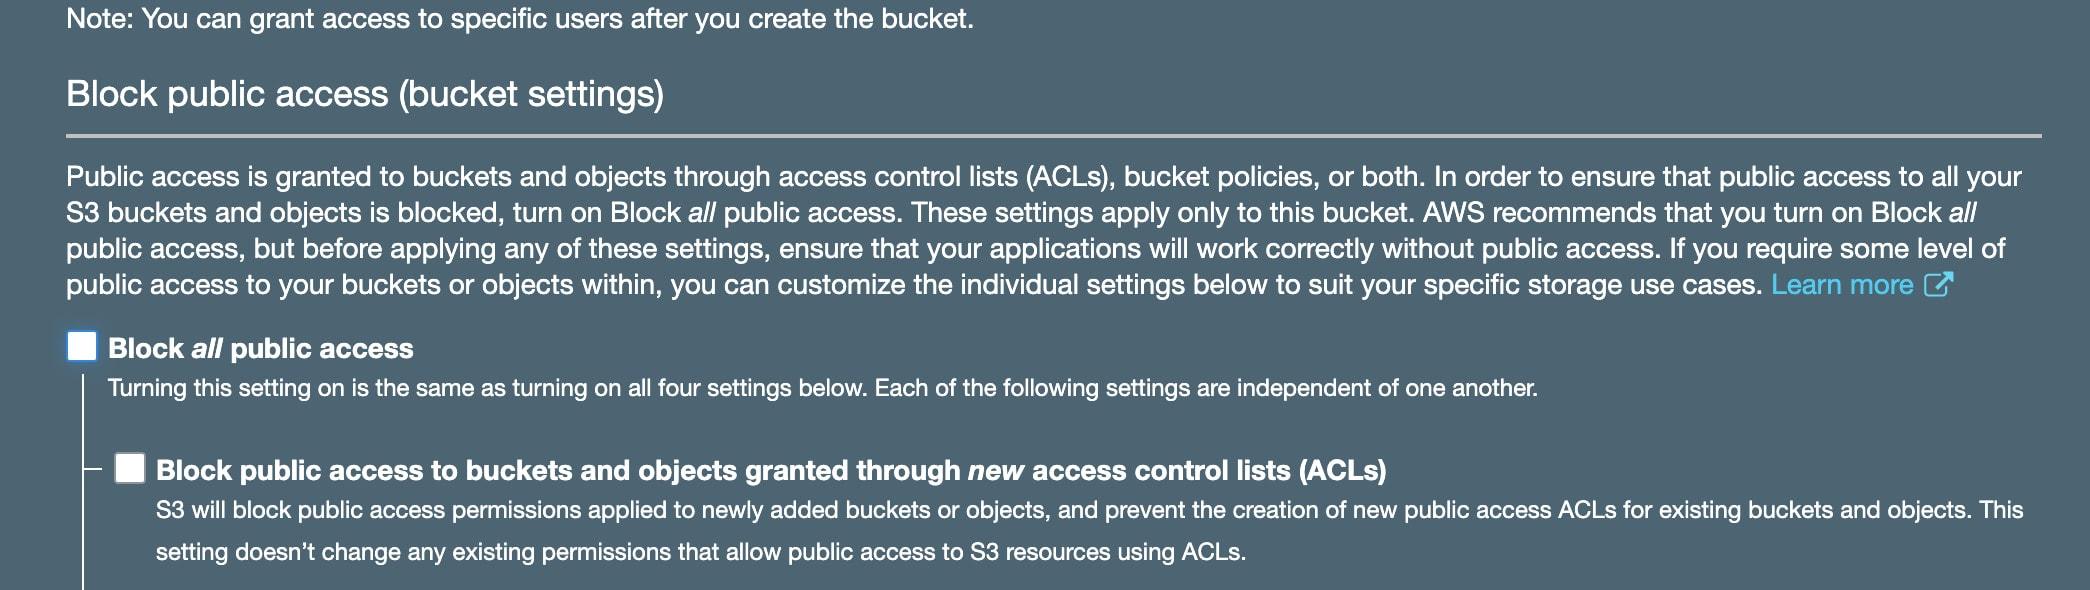 Unblock public access